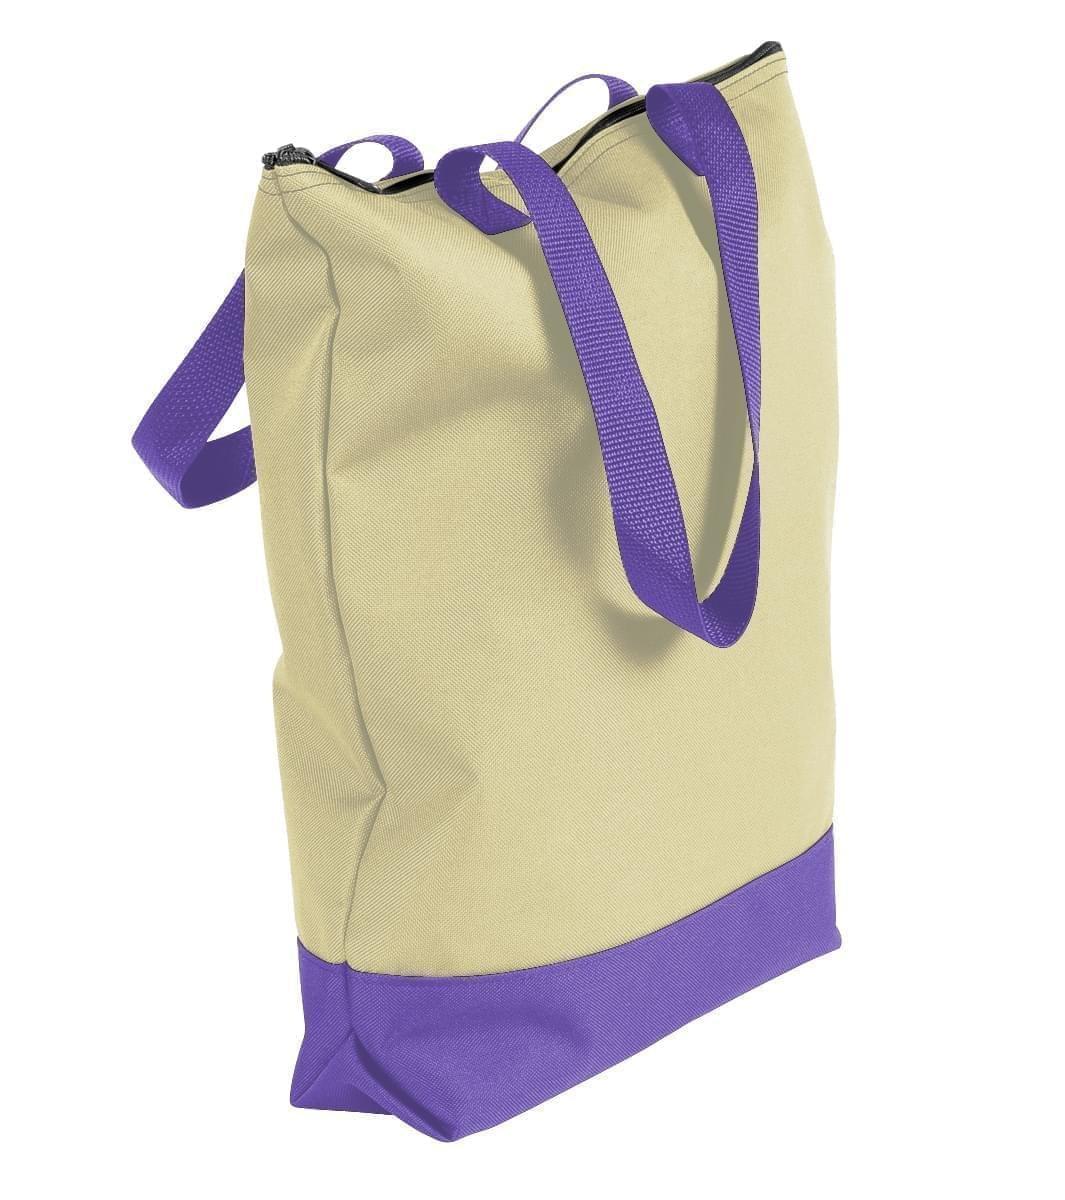 USA Made Canvas Portfolio Tote Bags, Natural-Purple, 1AAMX1UAK1